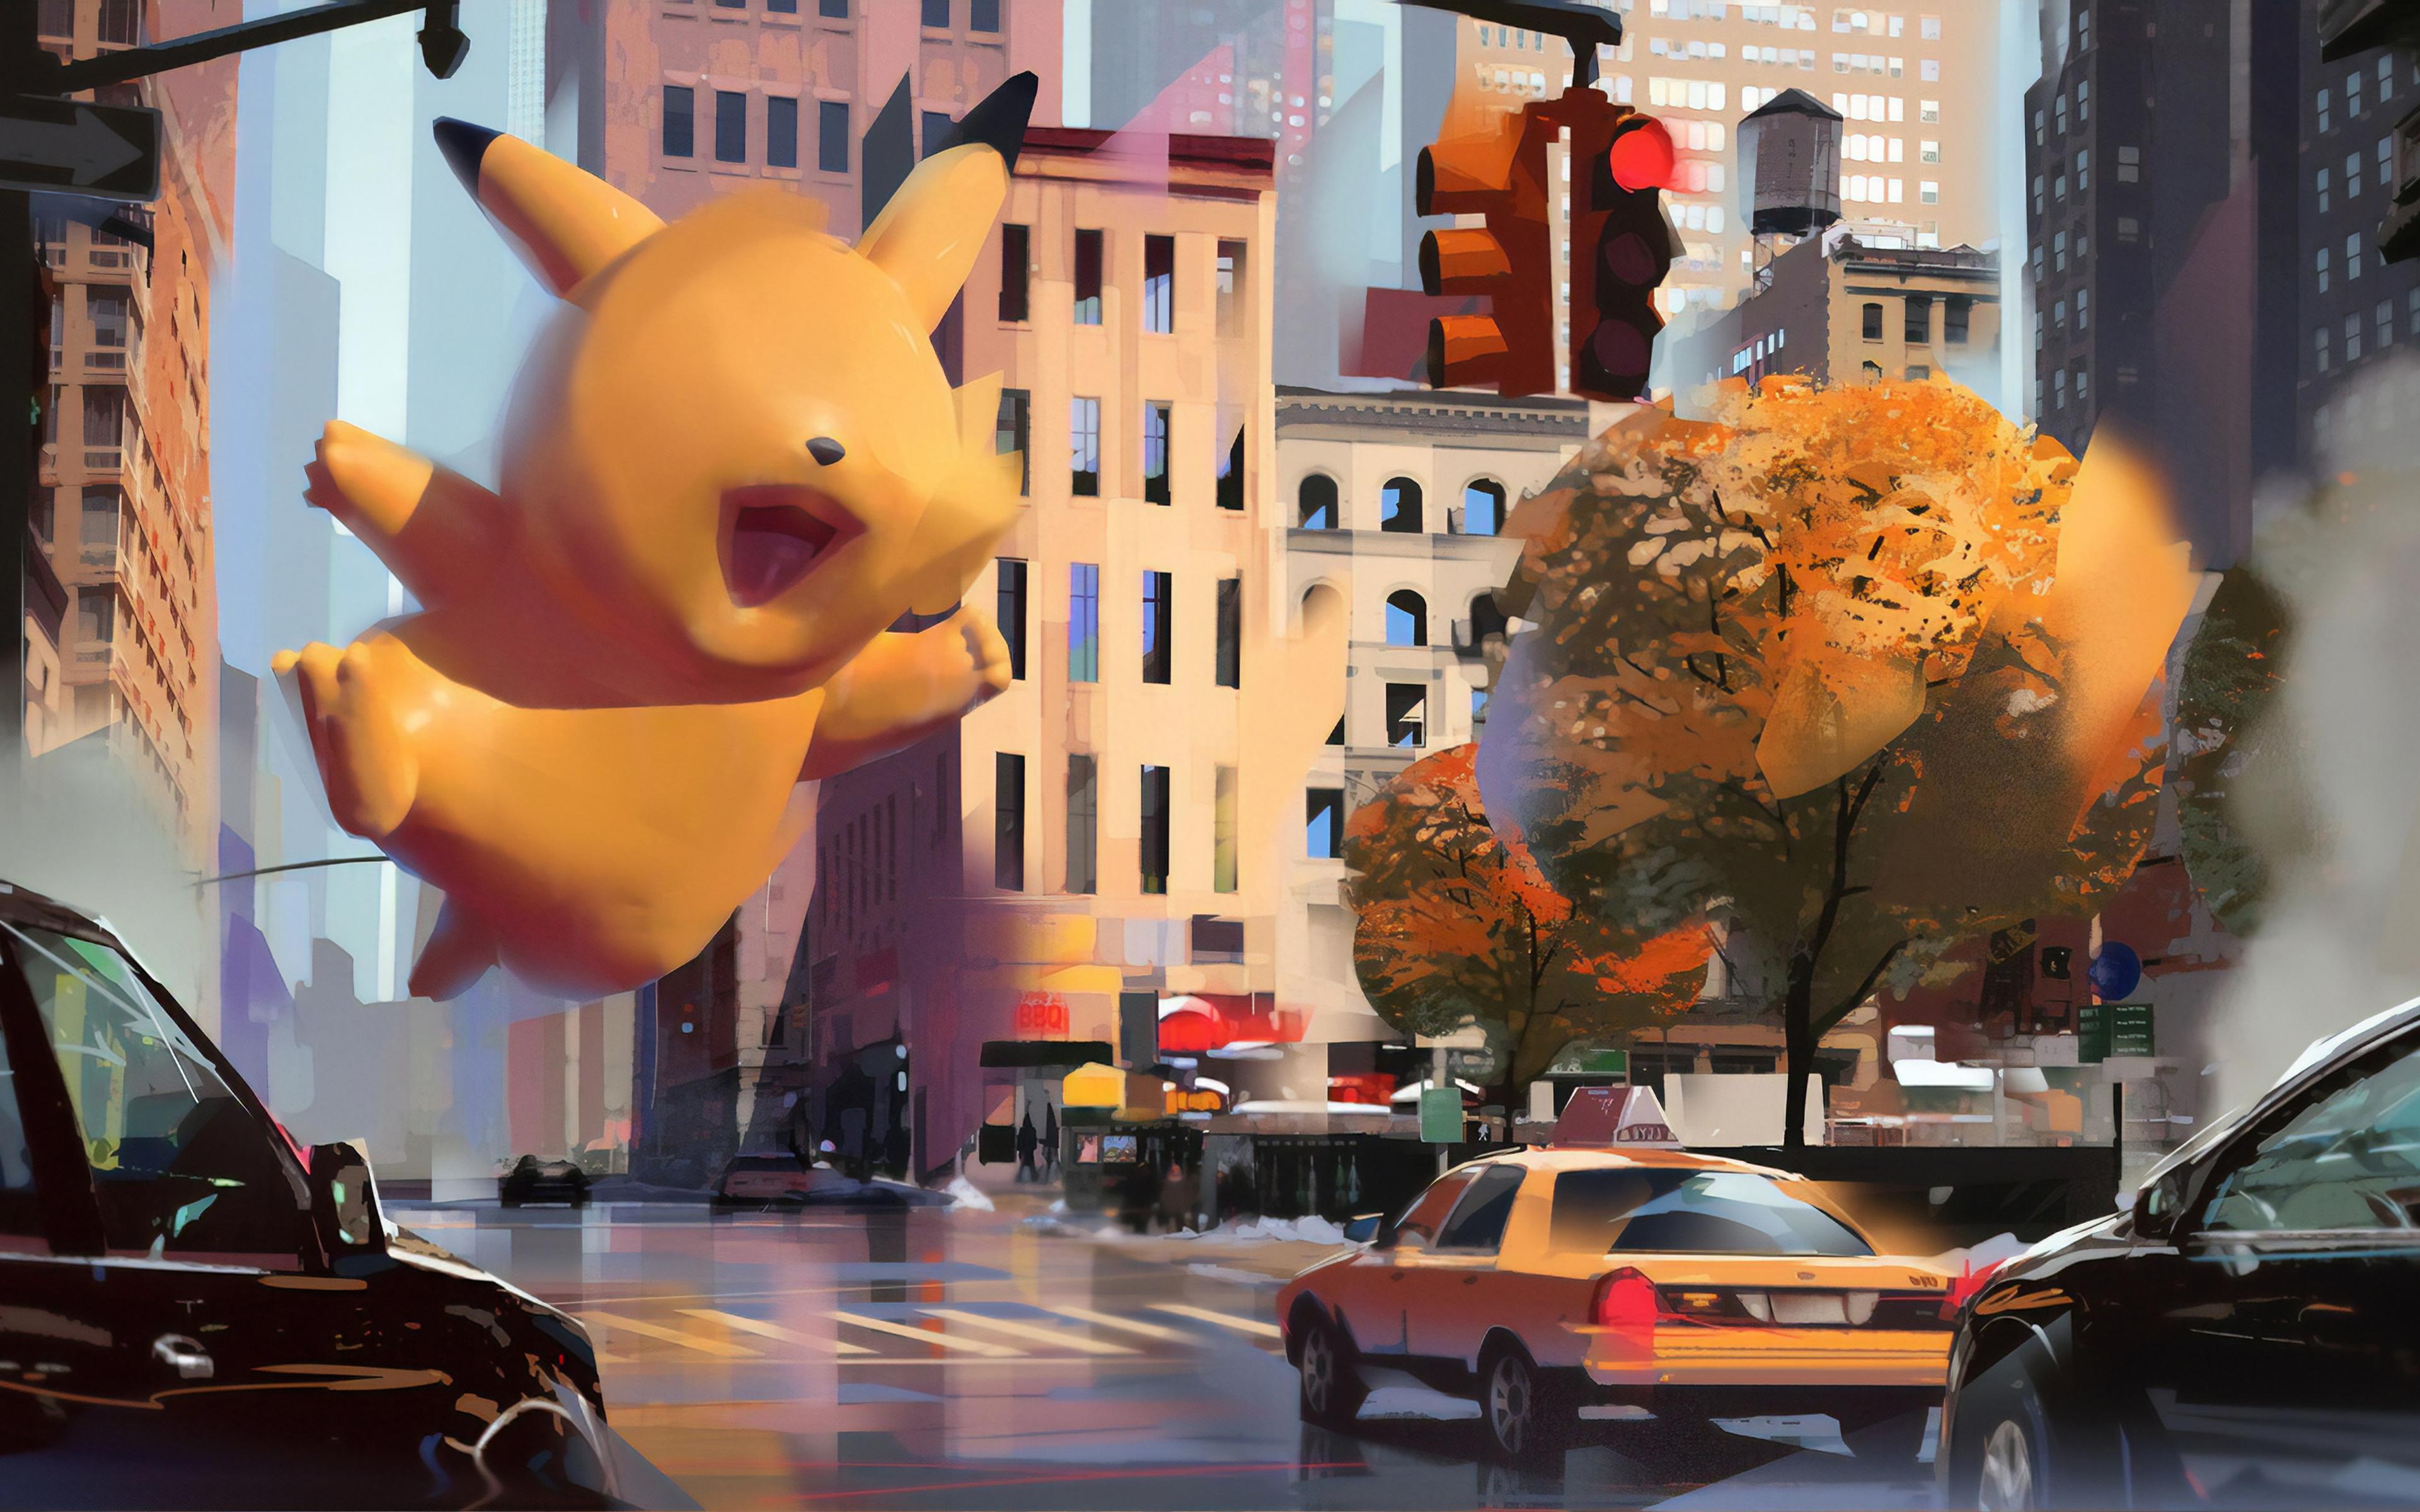 pikachu-in-city-na.jpg